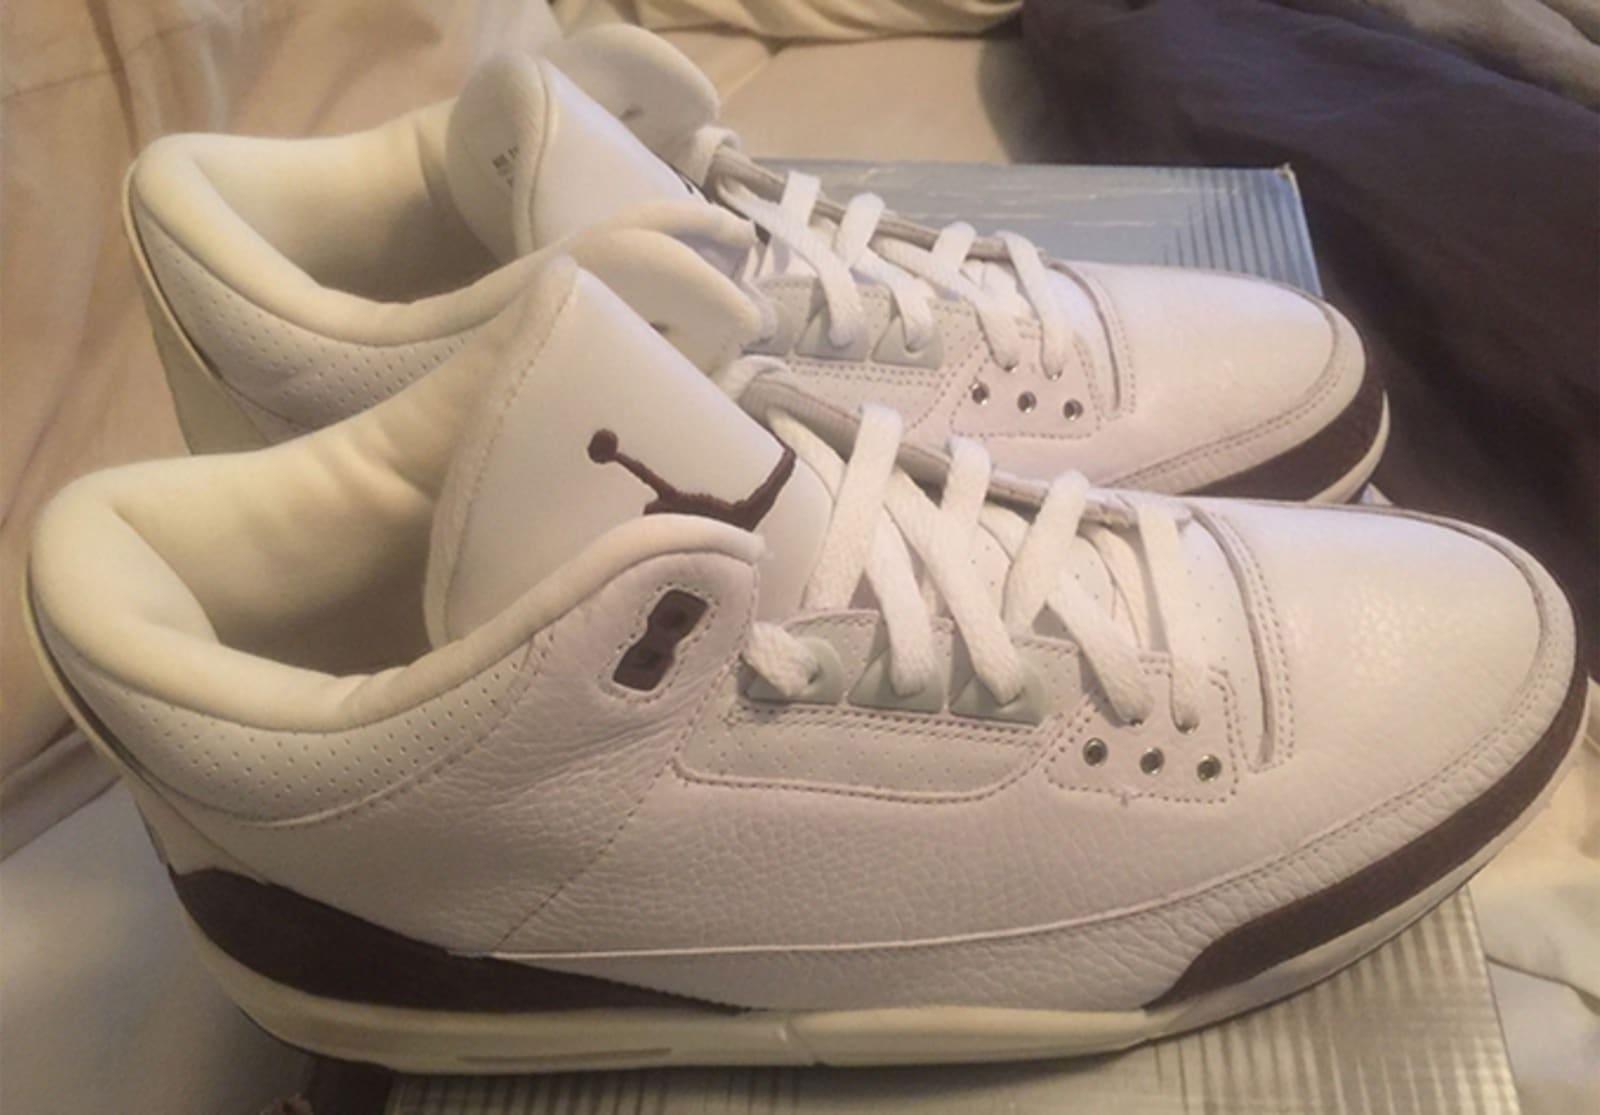 c49c93f1c2c 20 Deadstock Air Jordans 00s eBay Right Now   Sole Collector